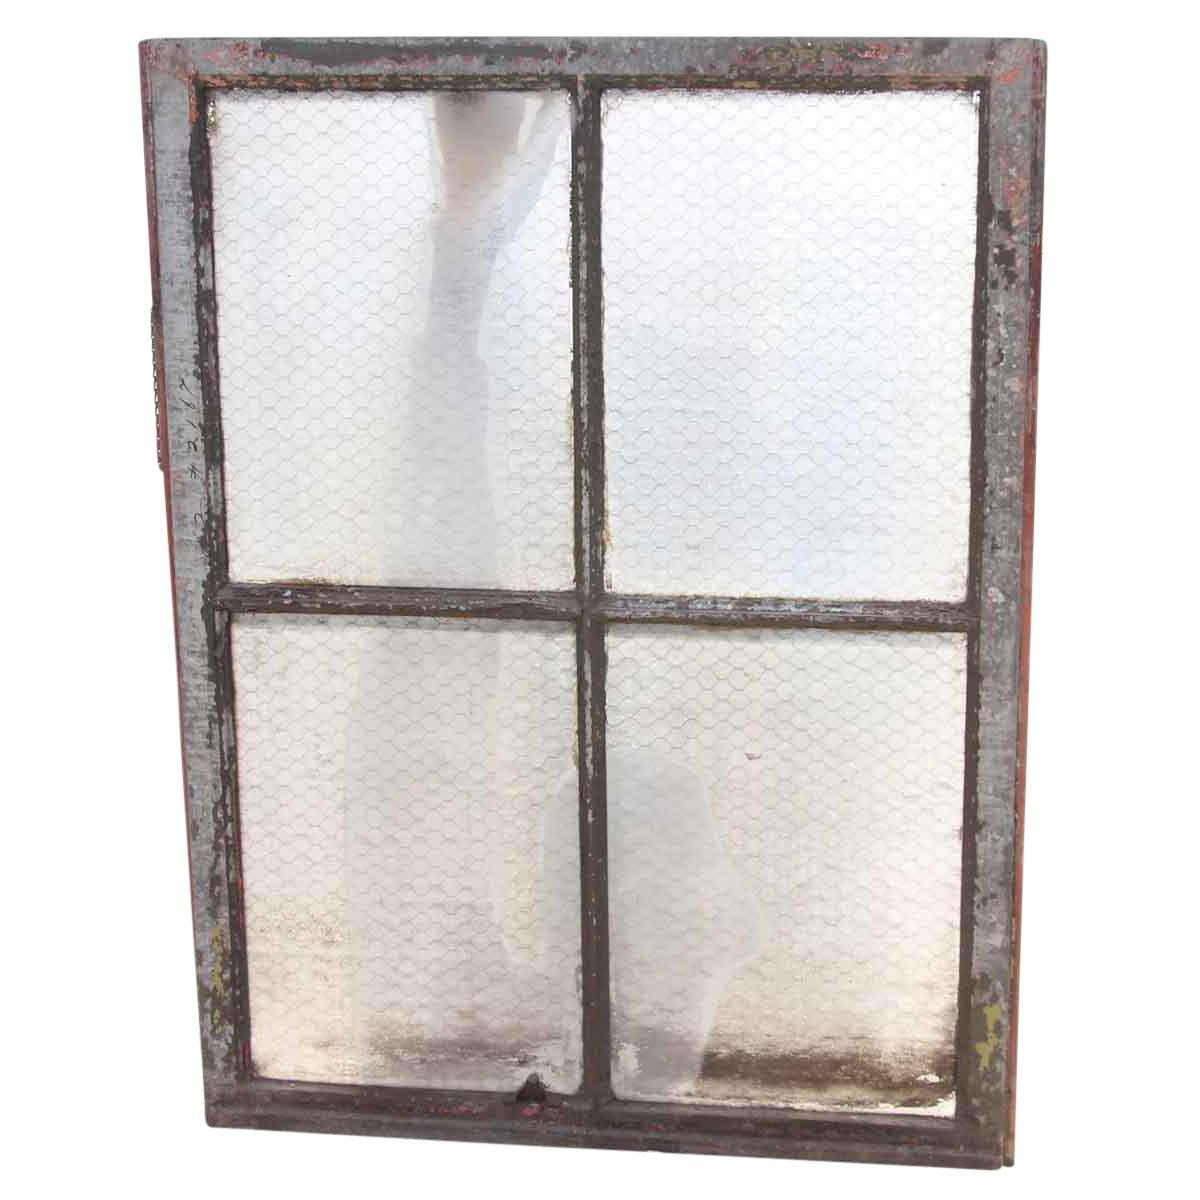 Four Pane Chicken Wire Glass Window With Galvanized Metal Frame ...